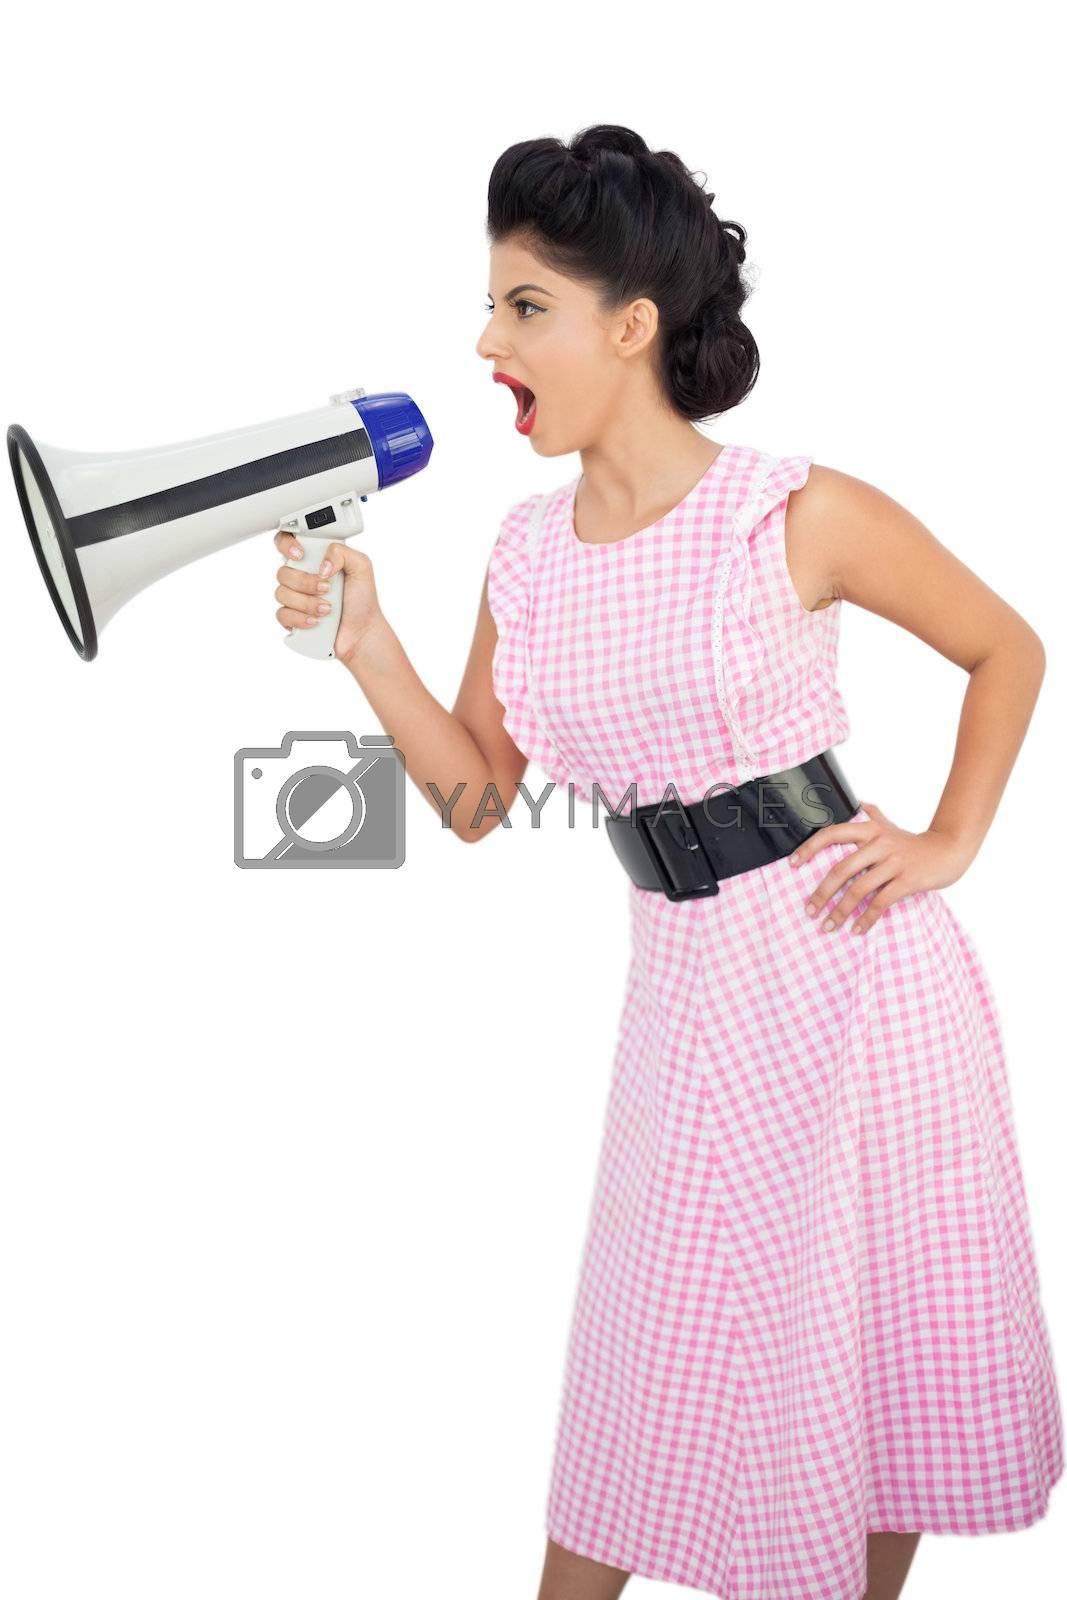 Angry black hair model shouting in a megaphone by Wavebreakmedia